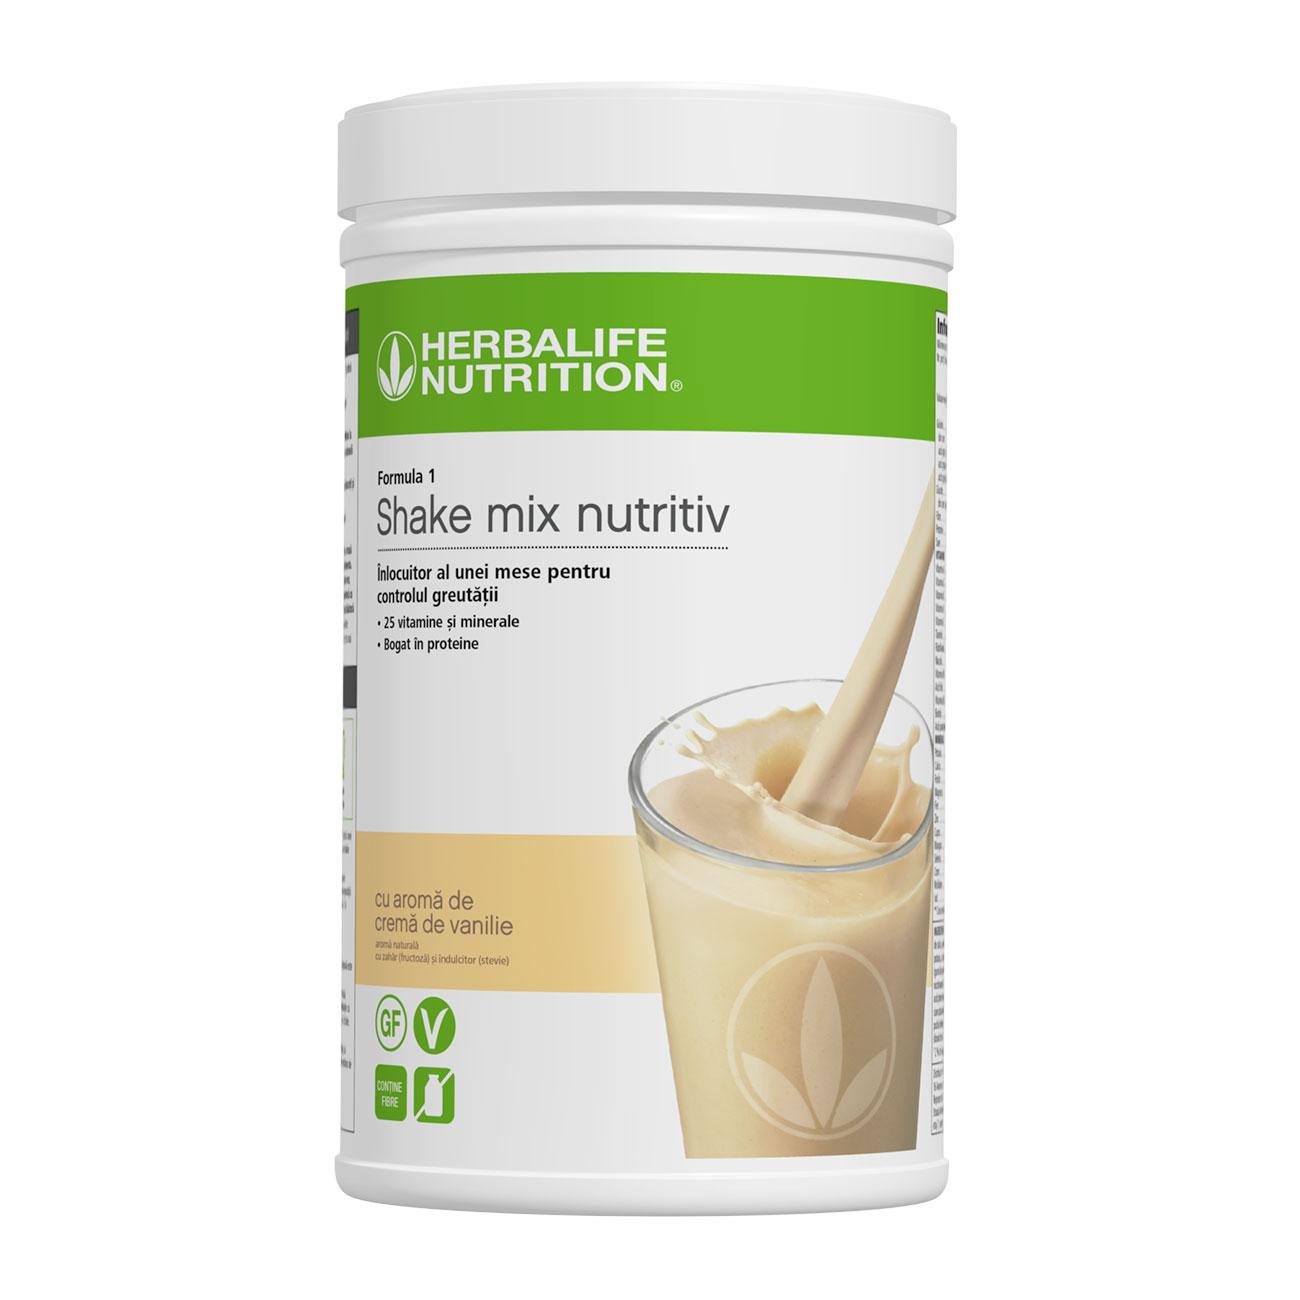 Formula 1 Shake mix nutritiv Cremă de vanilie 550g